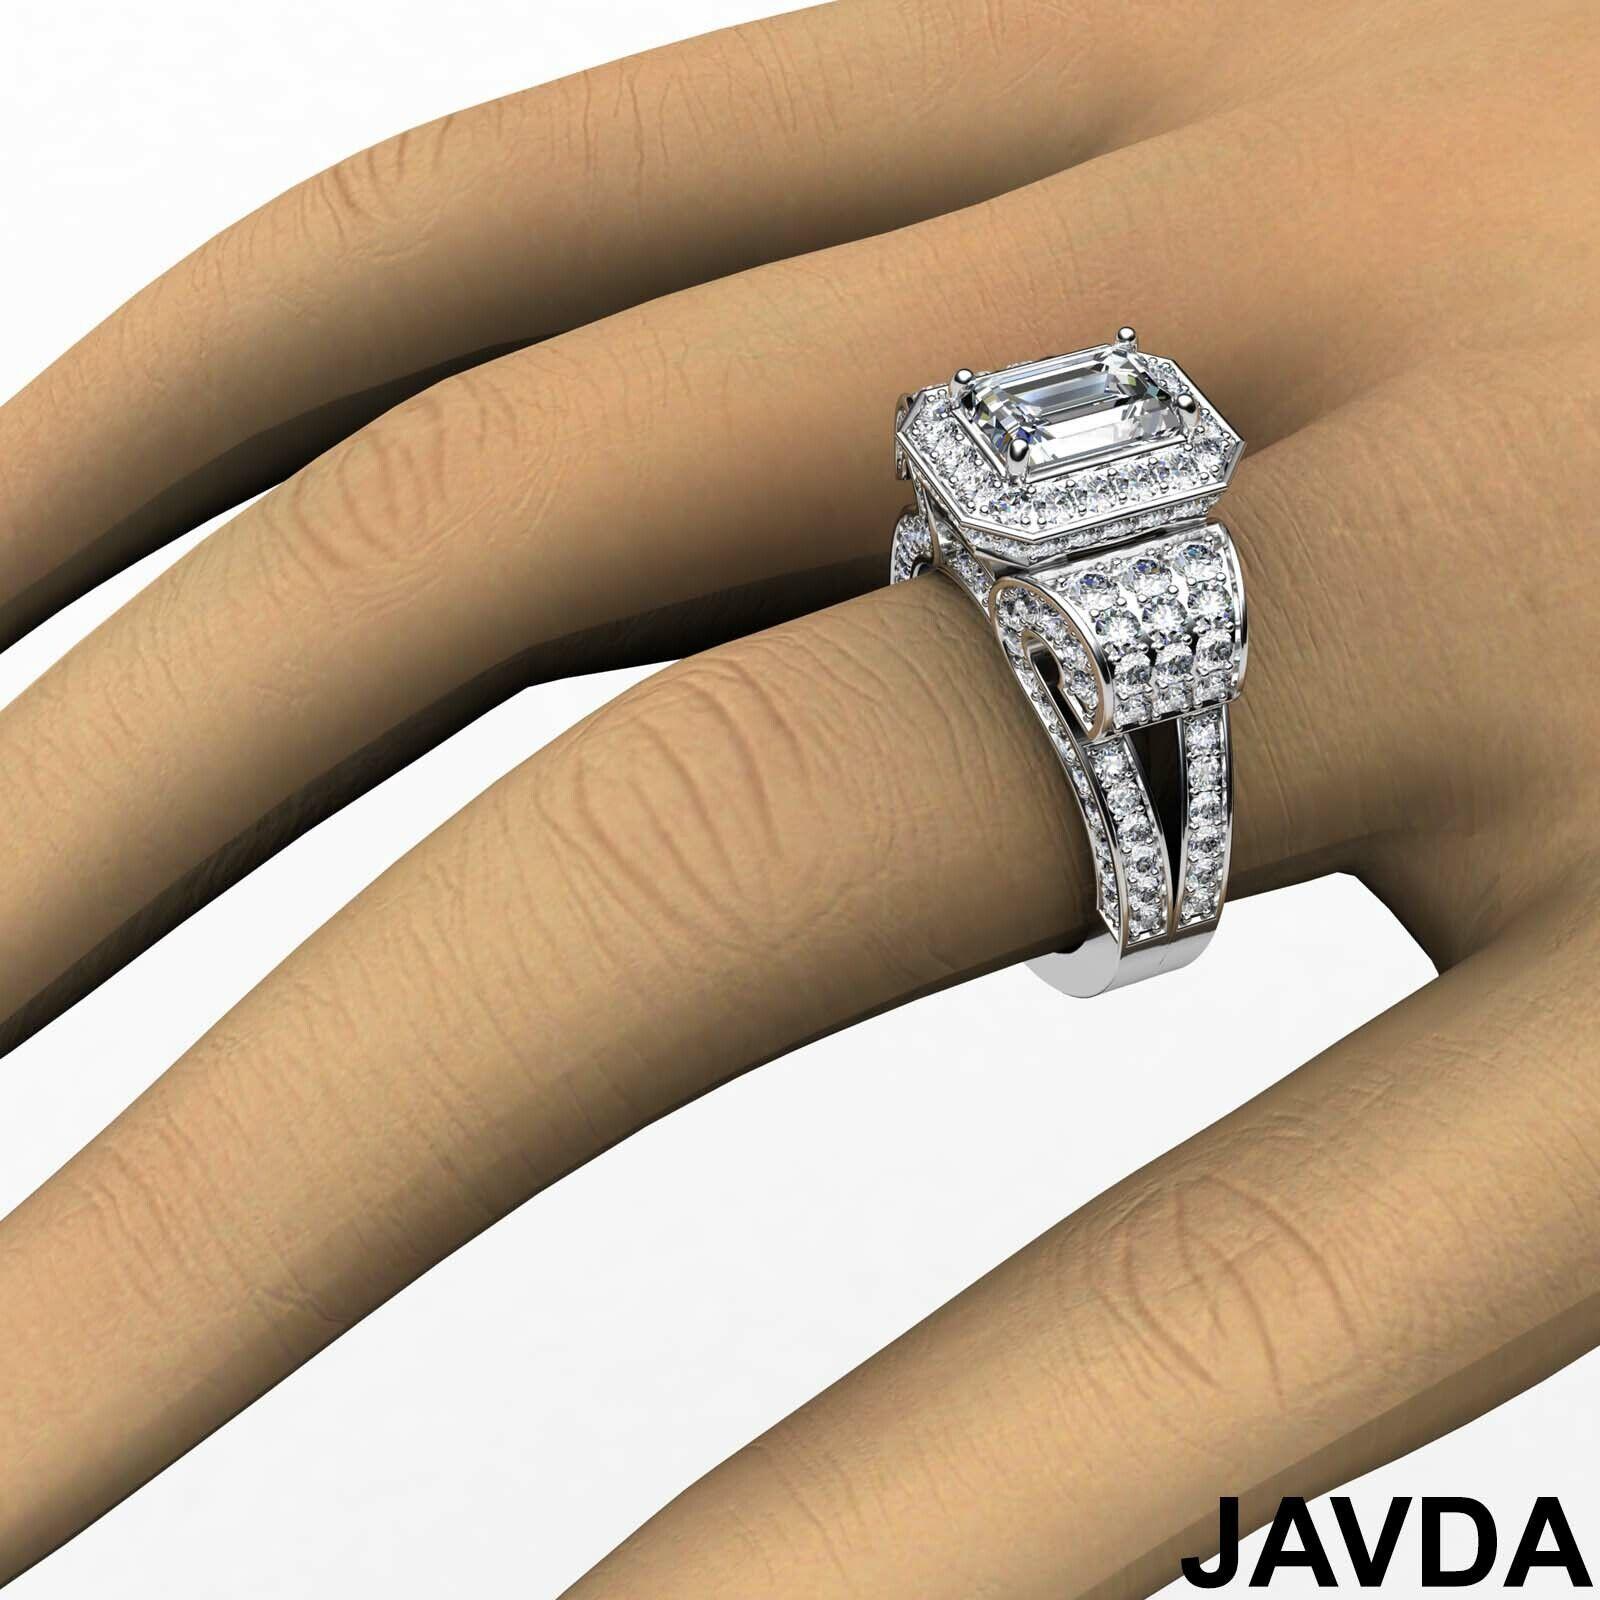 4.4ctw Antique Vintage Halo Emerald Diamond Engagement Ring GIA I-VS1 White Gold 5